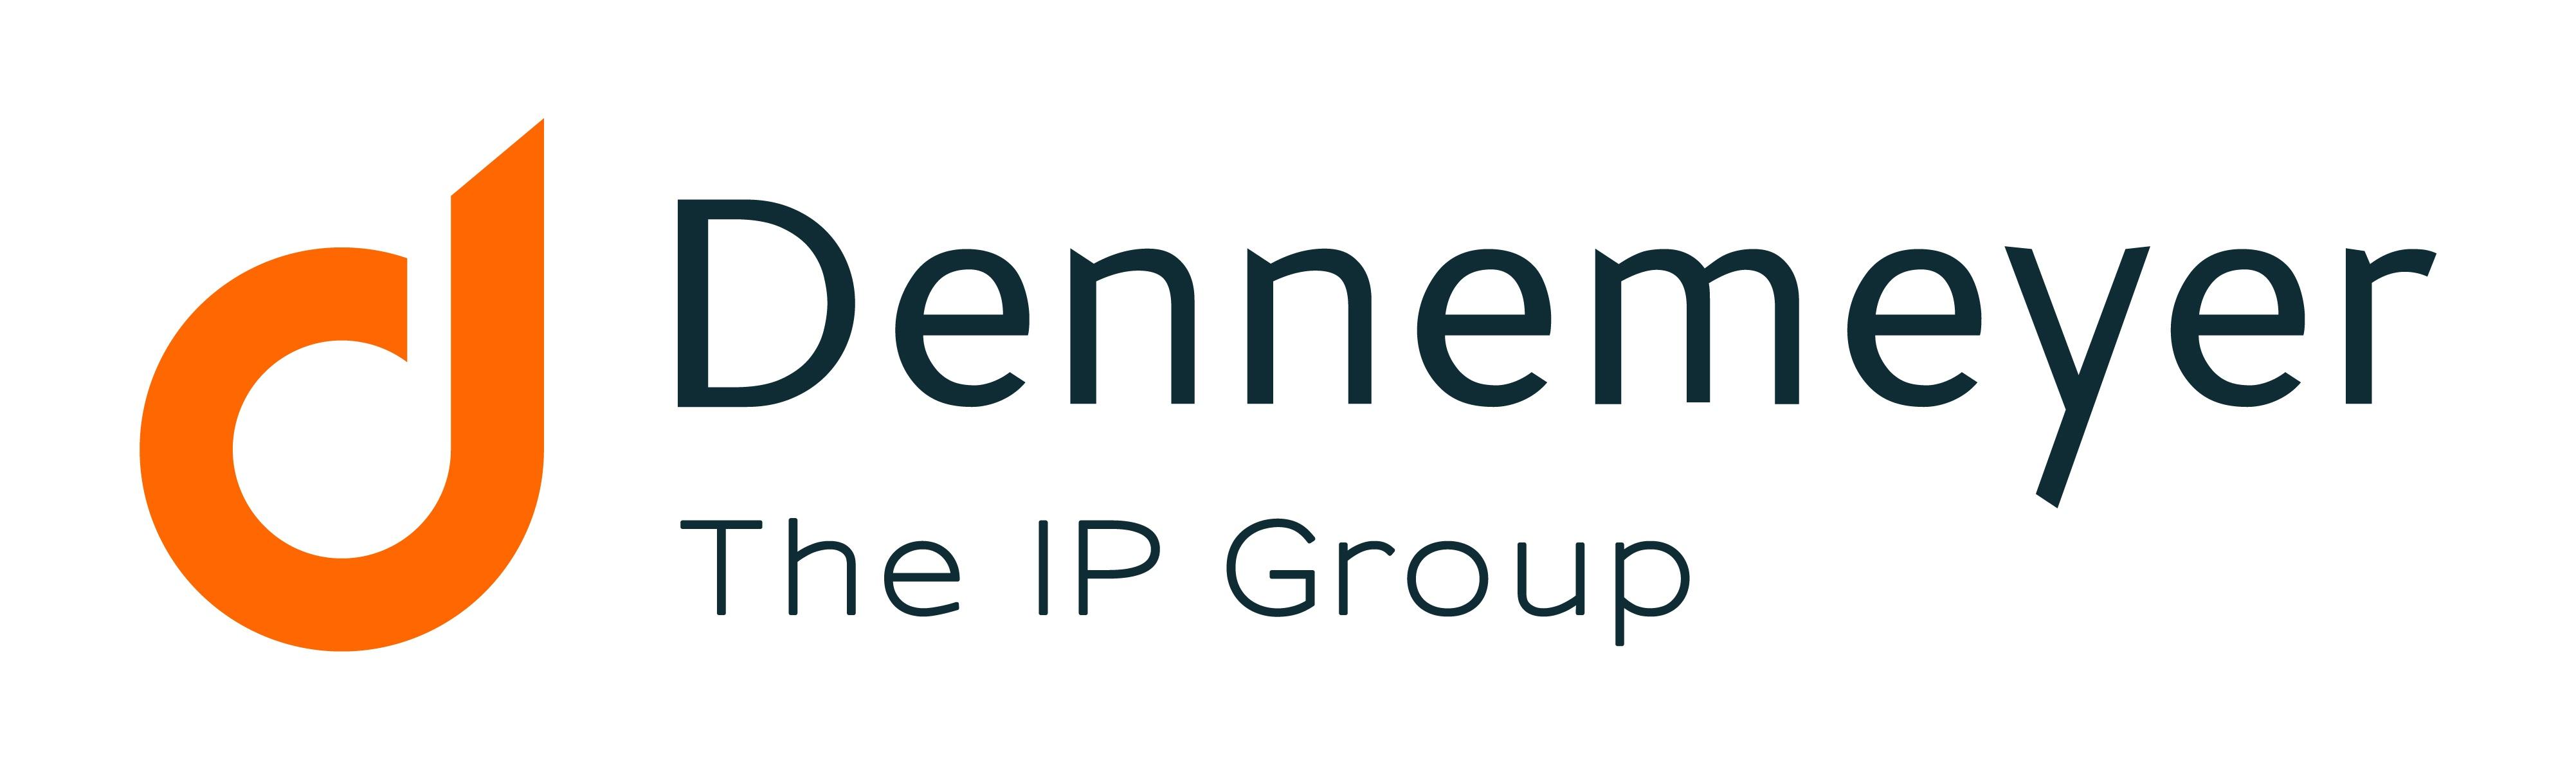 new_logo_group-website-relaunch